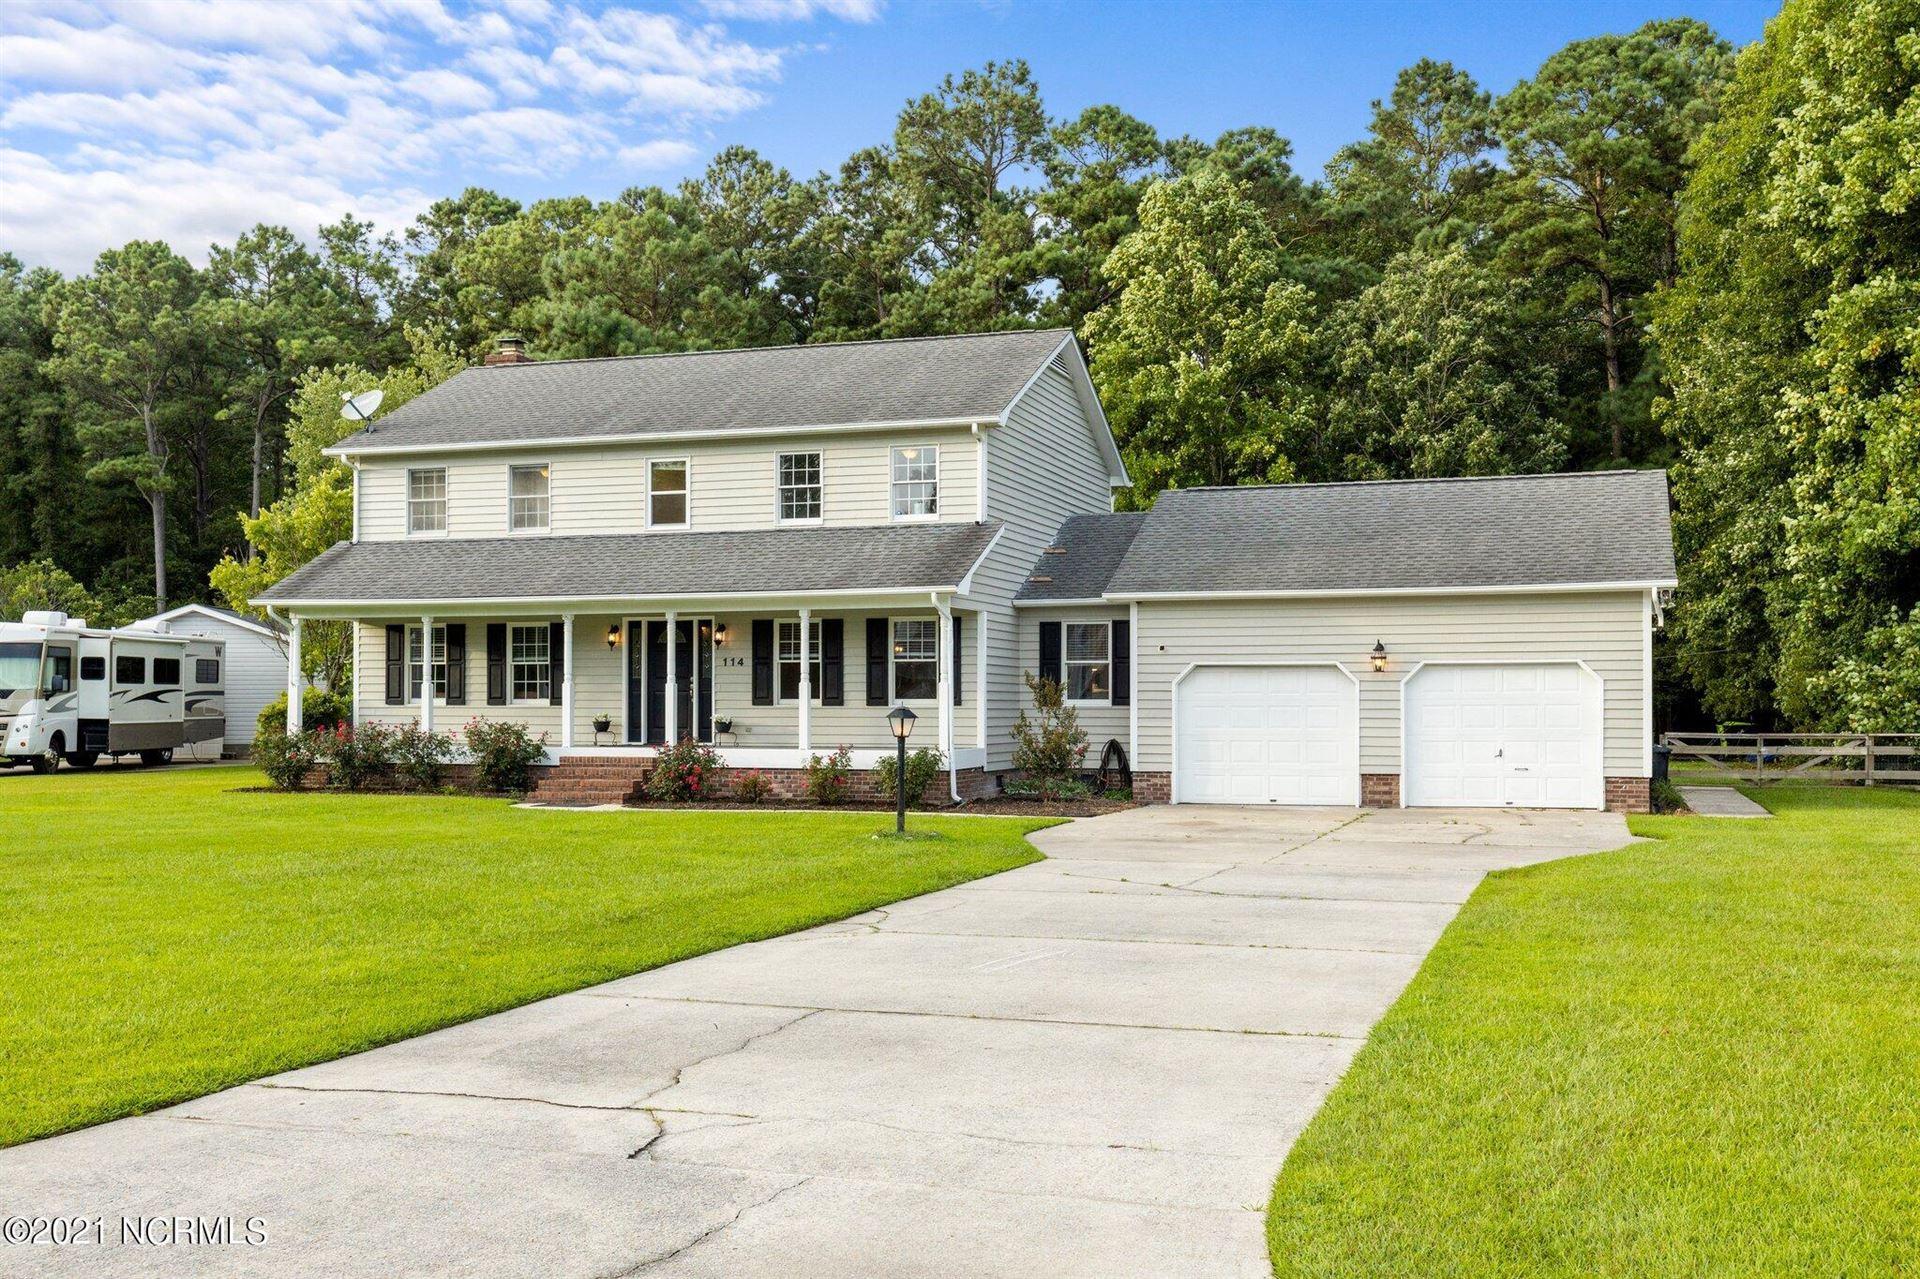 Photo of 114 Bonita Lane, Swansboro, NC 28584 (MLS # 100287050)